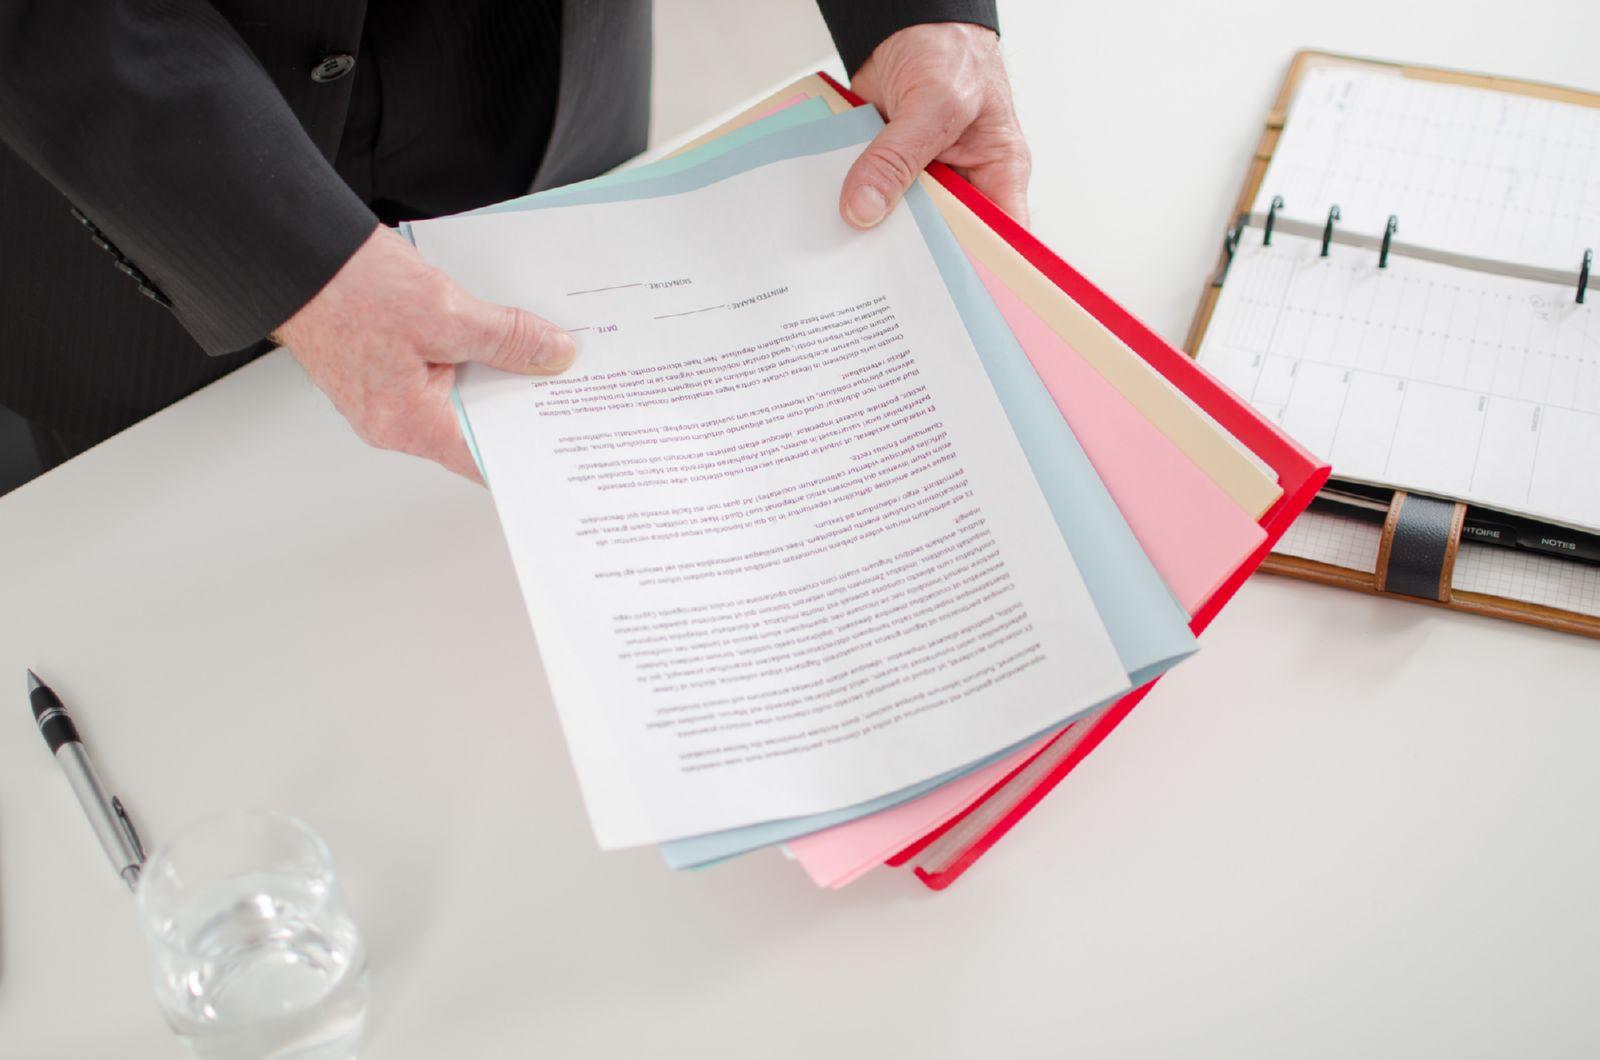 Перечень бумаг для ипотеки